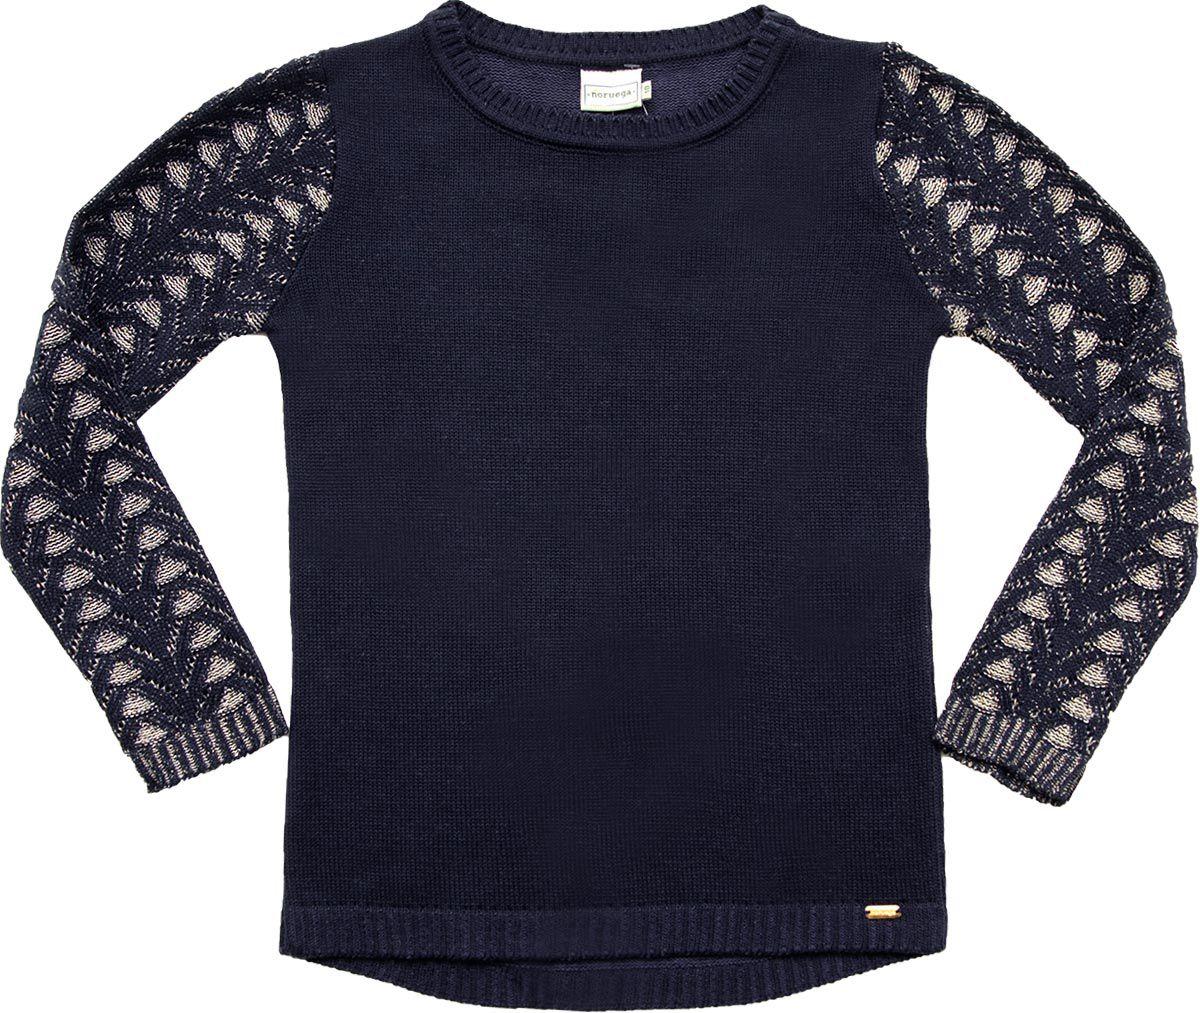 51.276 - Sweater Jacquard Folha com Lurex